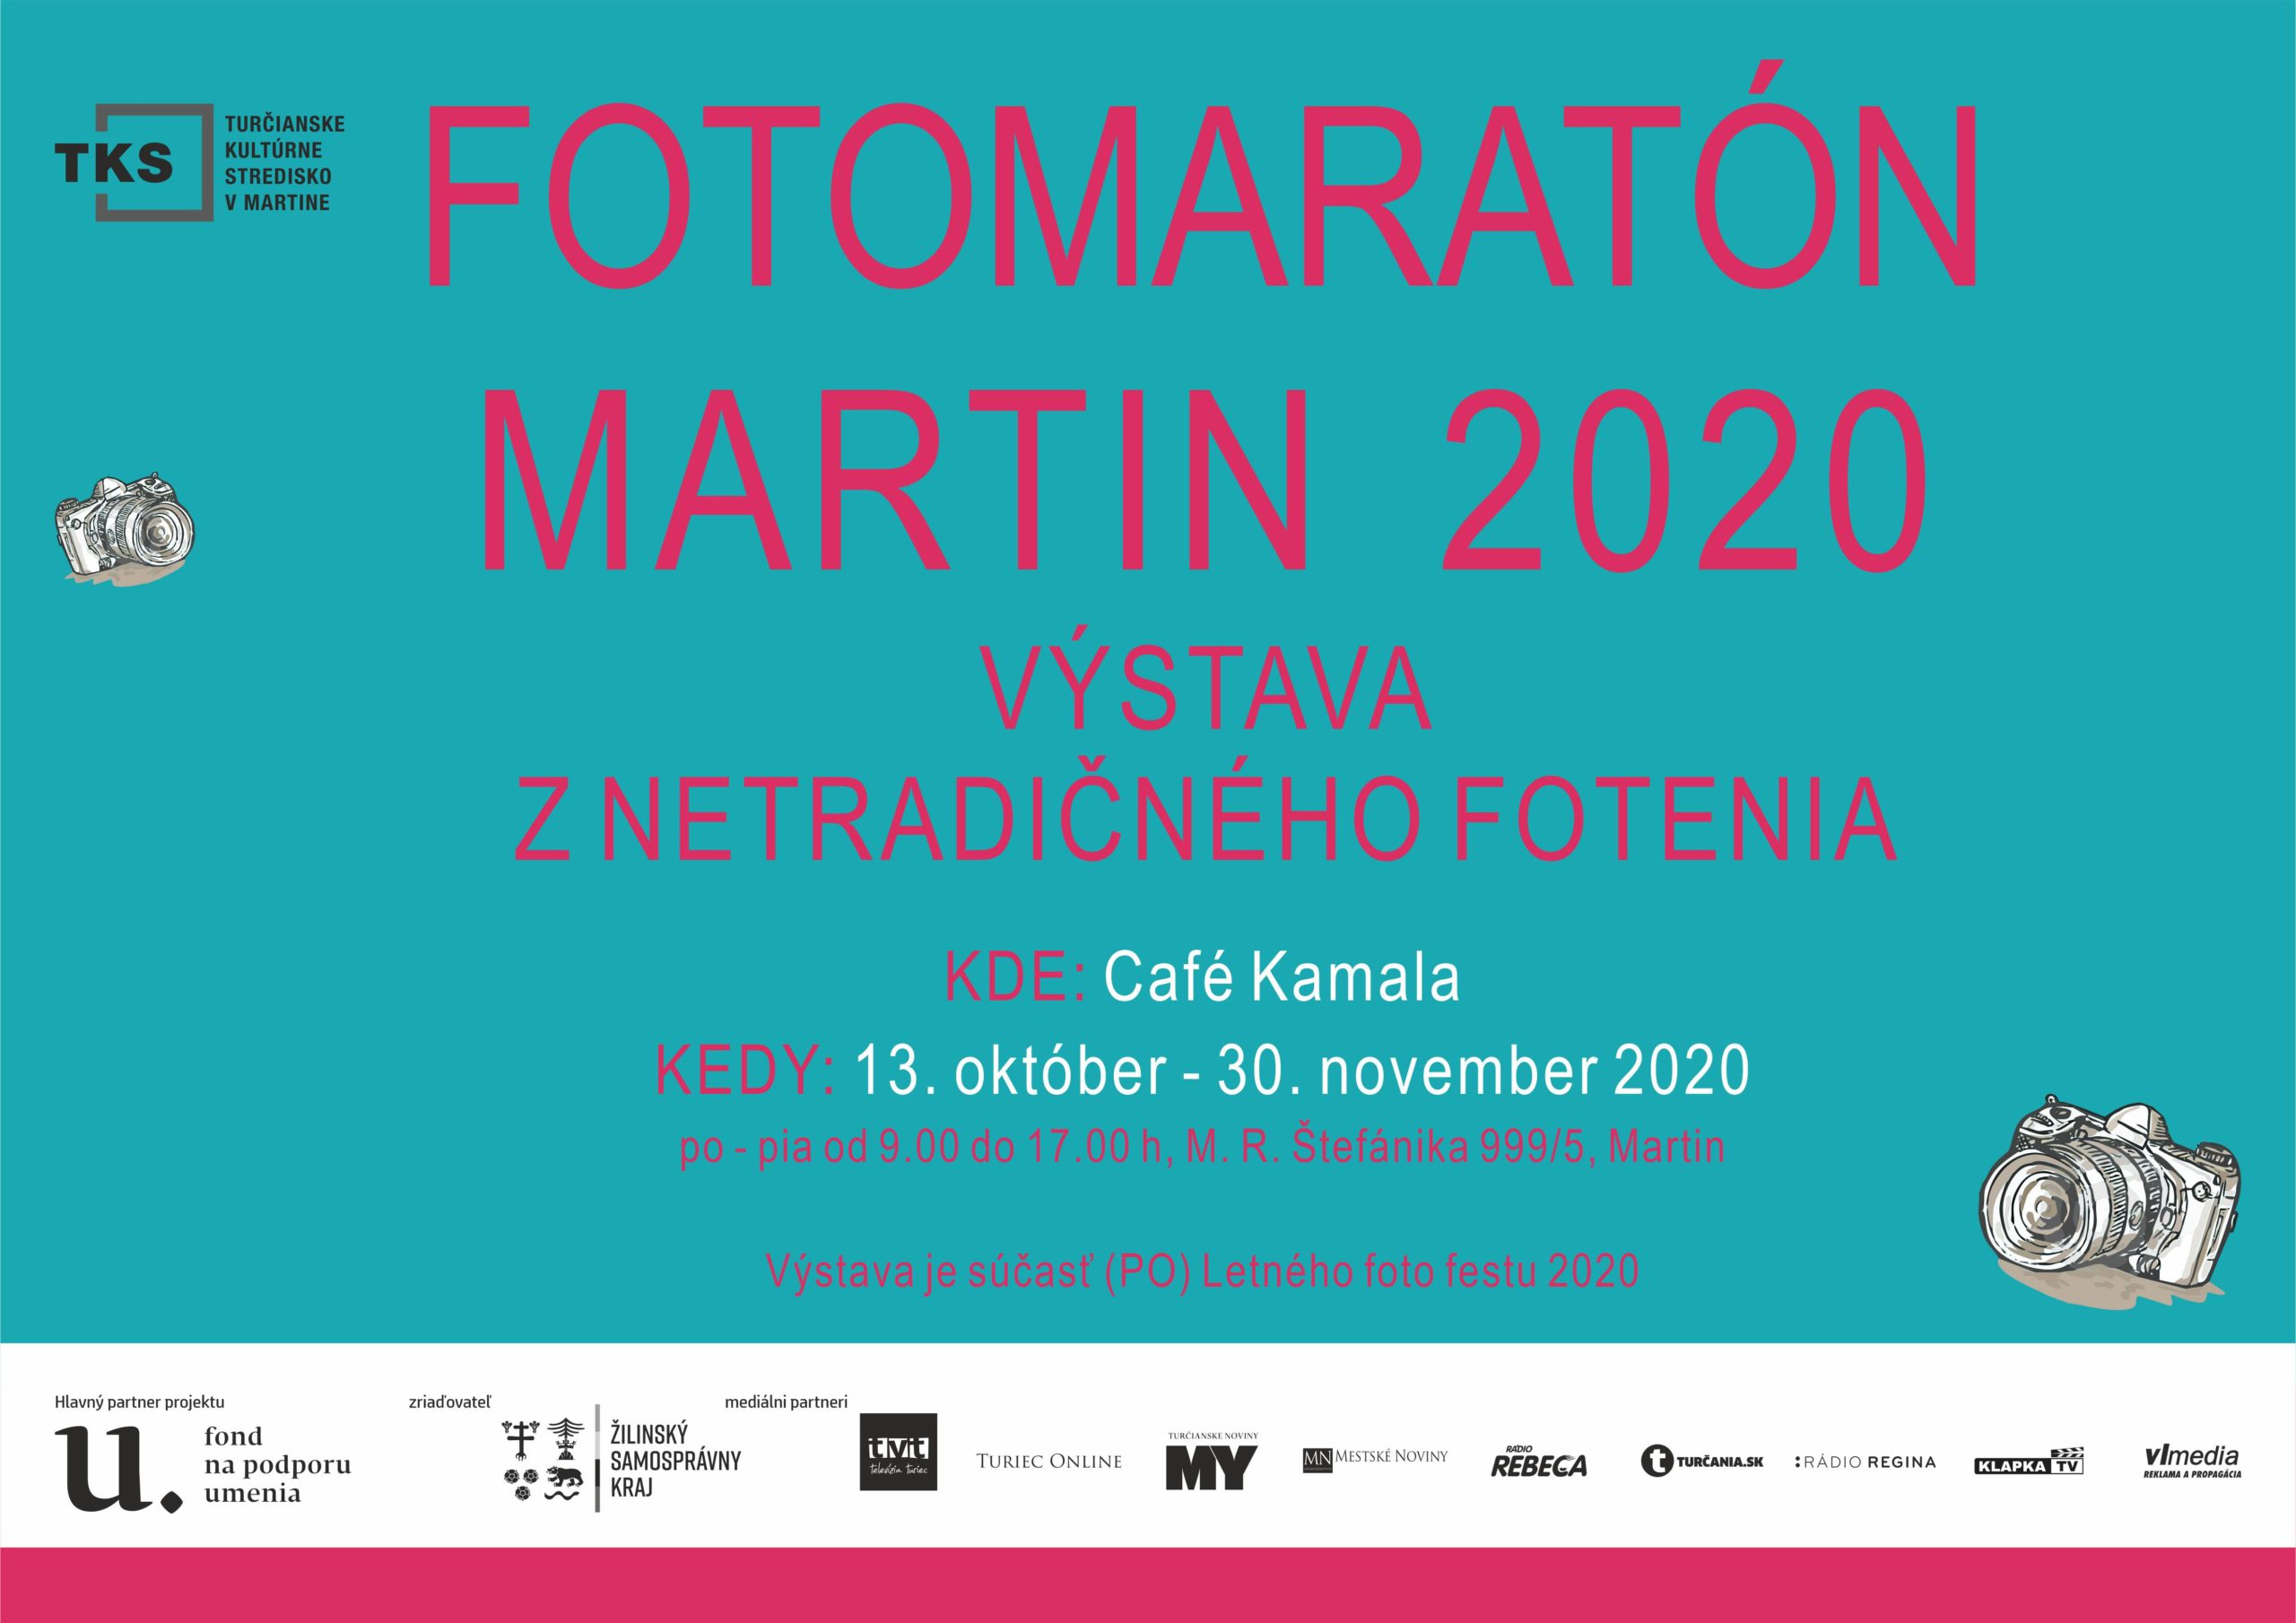 Fotomaratón Martin 2020 – výstava